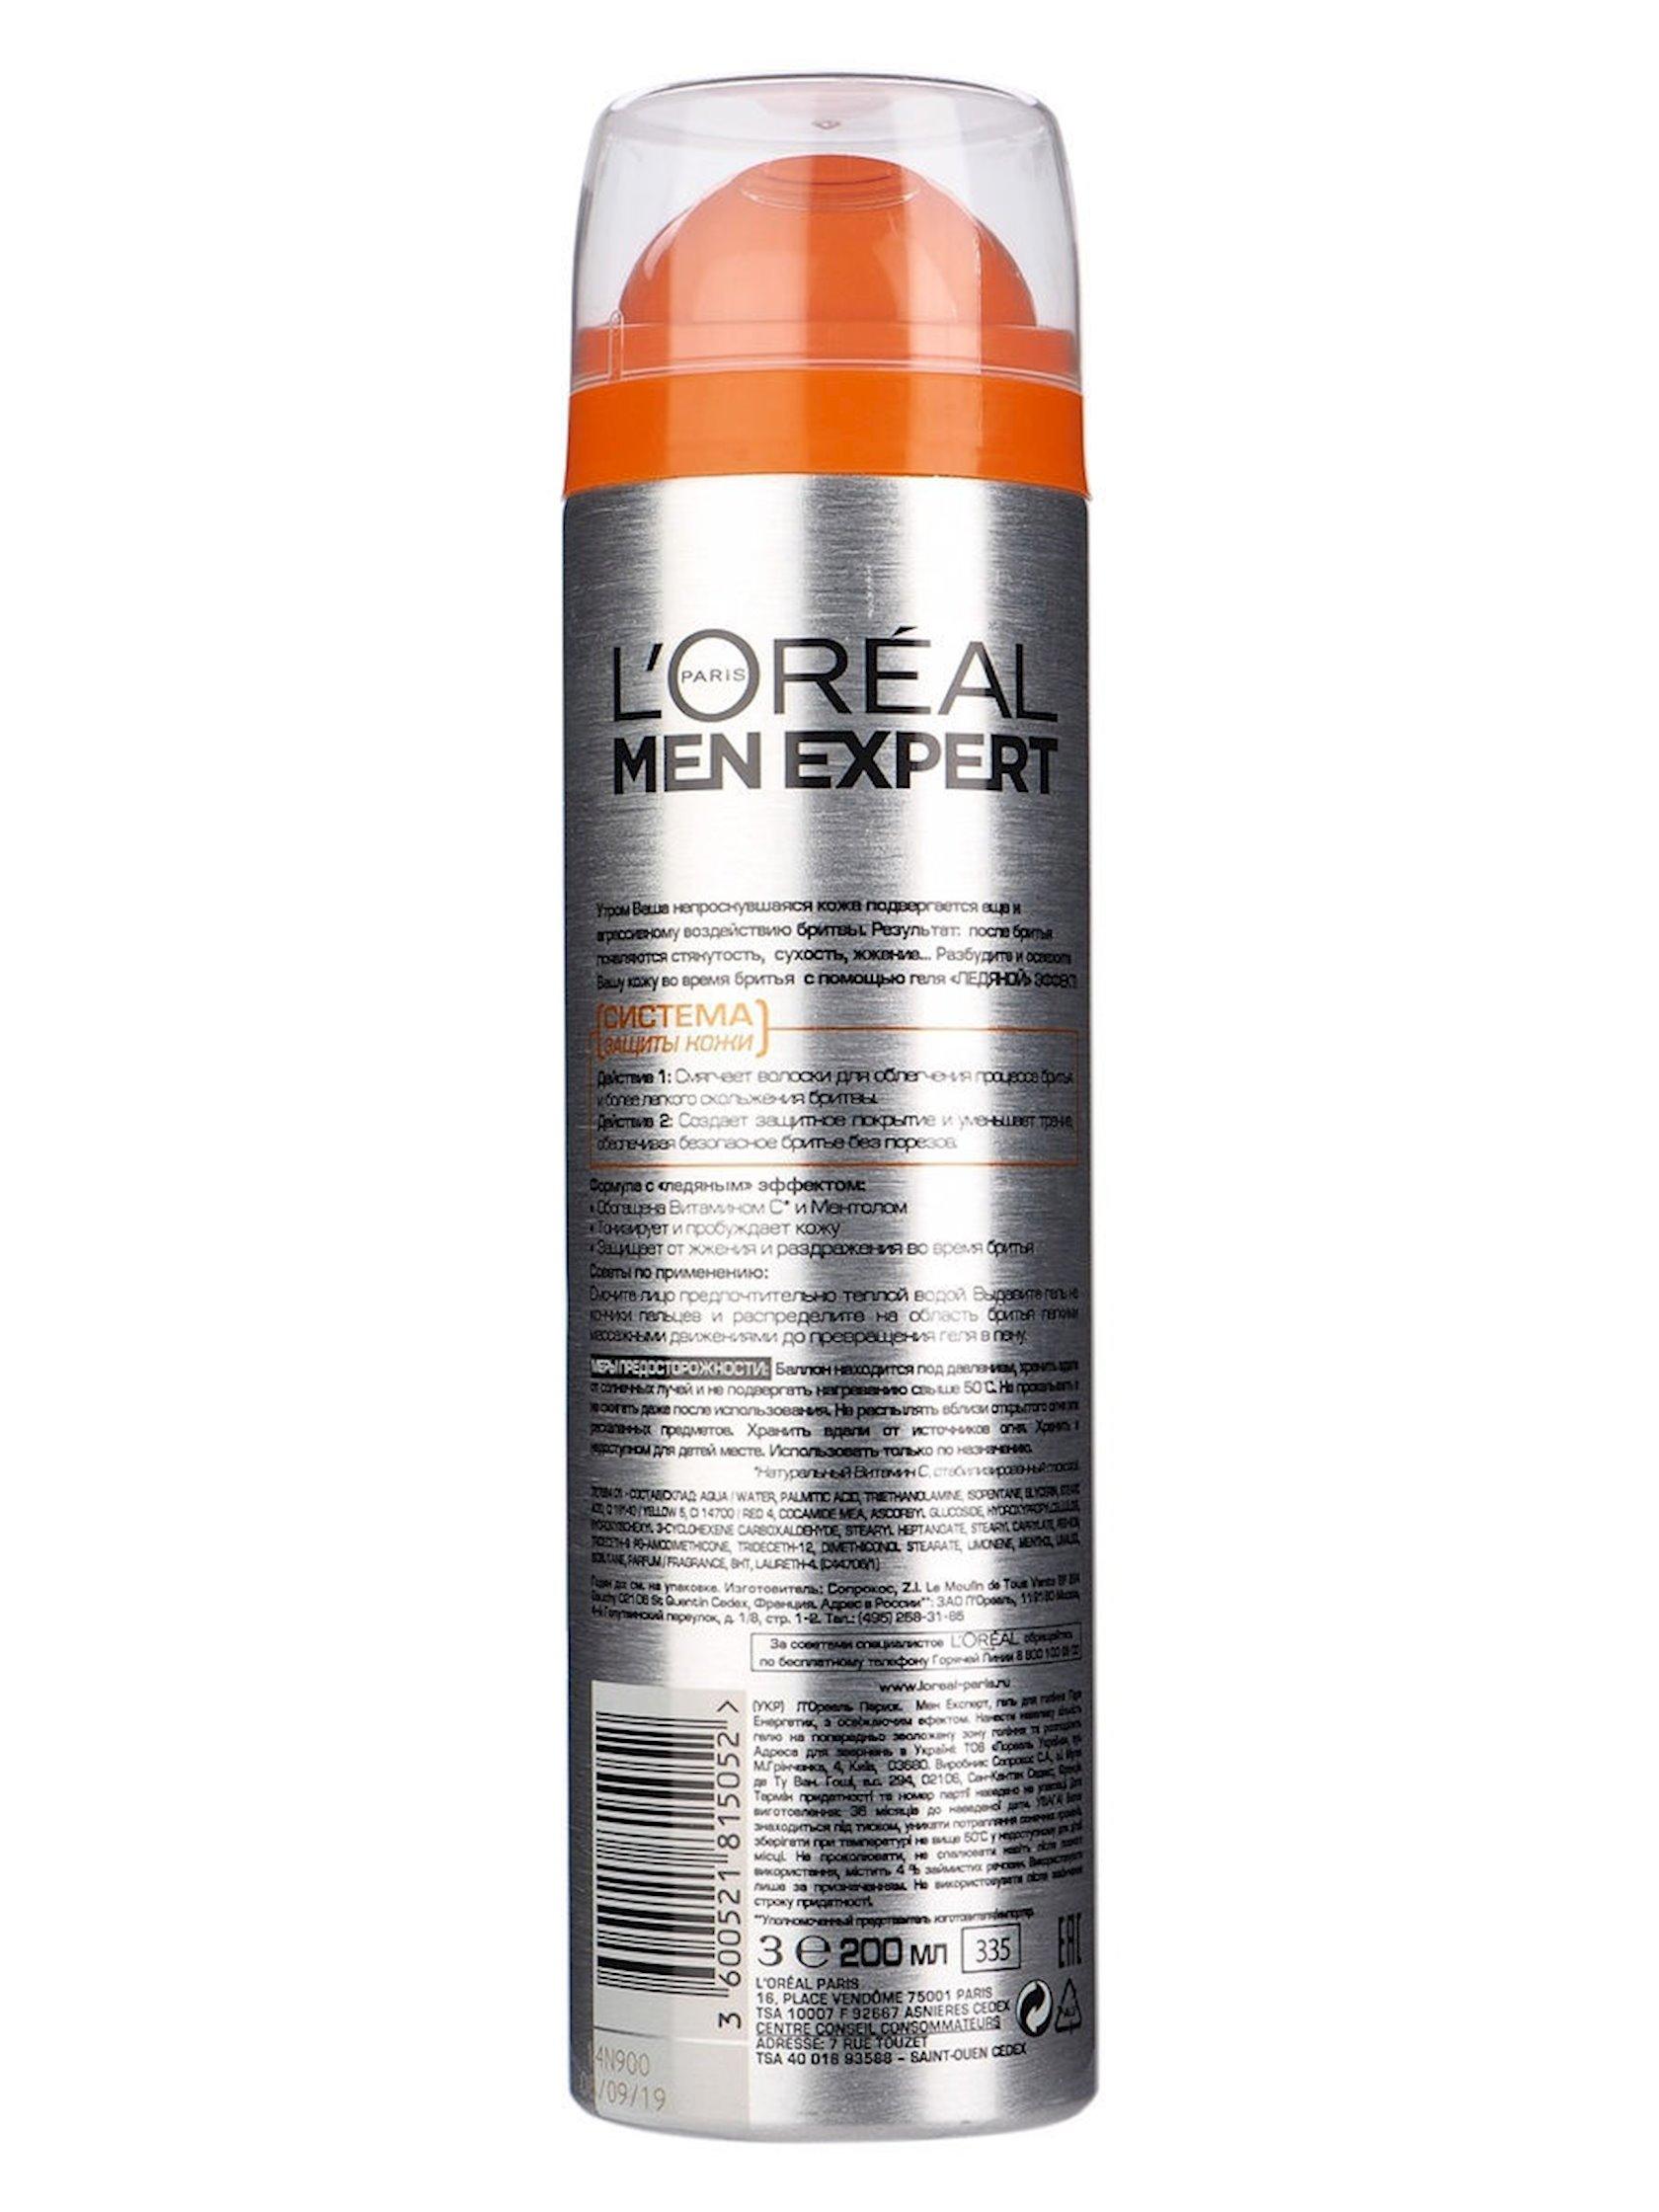 Təraş geli L'Oreal Paris Men Expert Buz effekti 200 ml